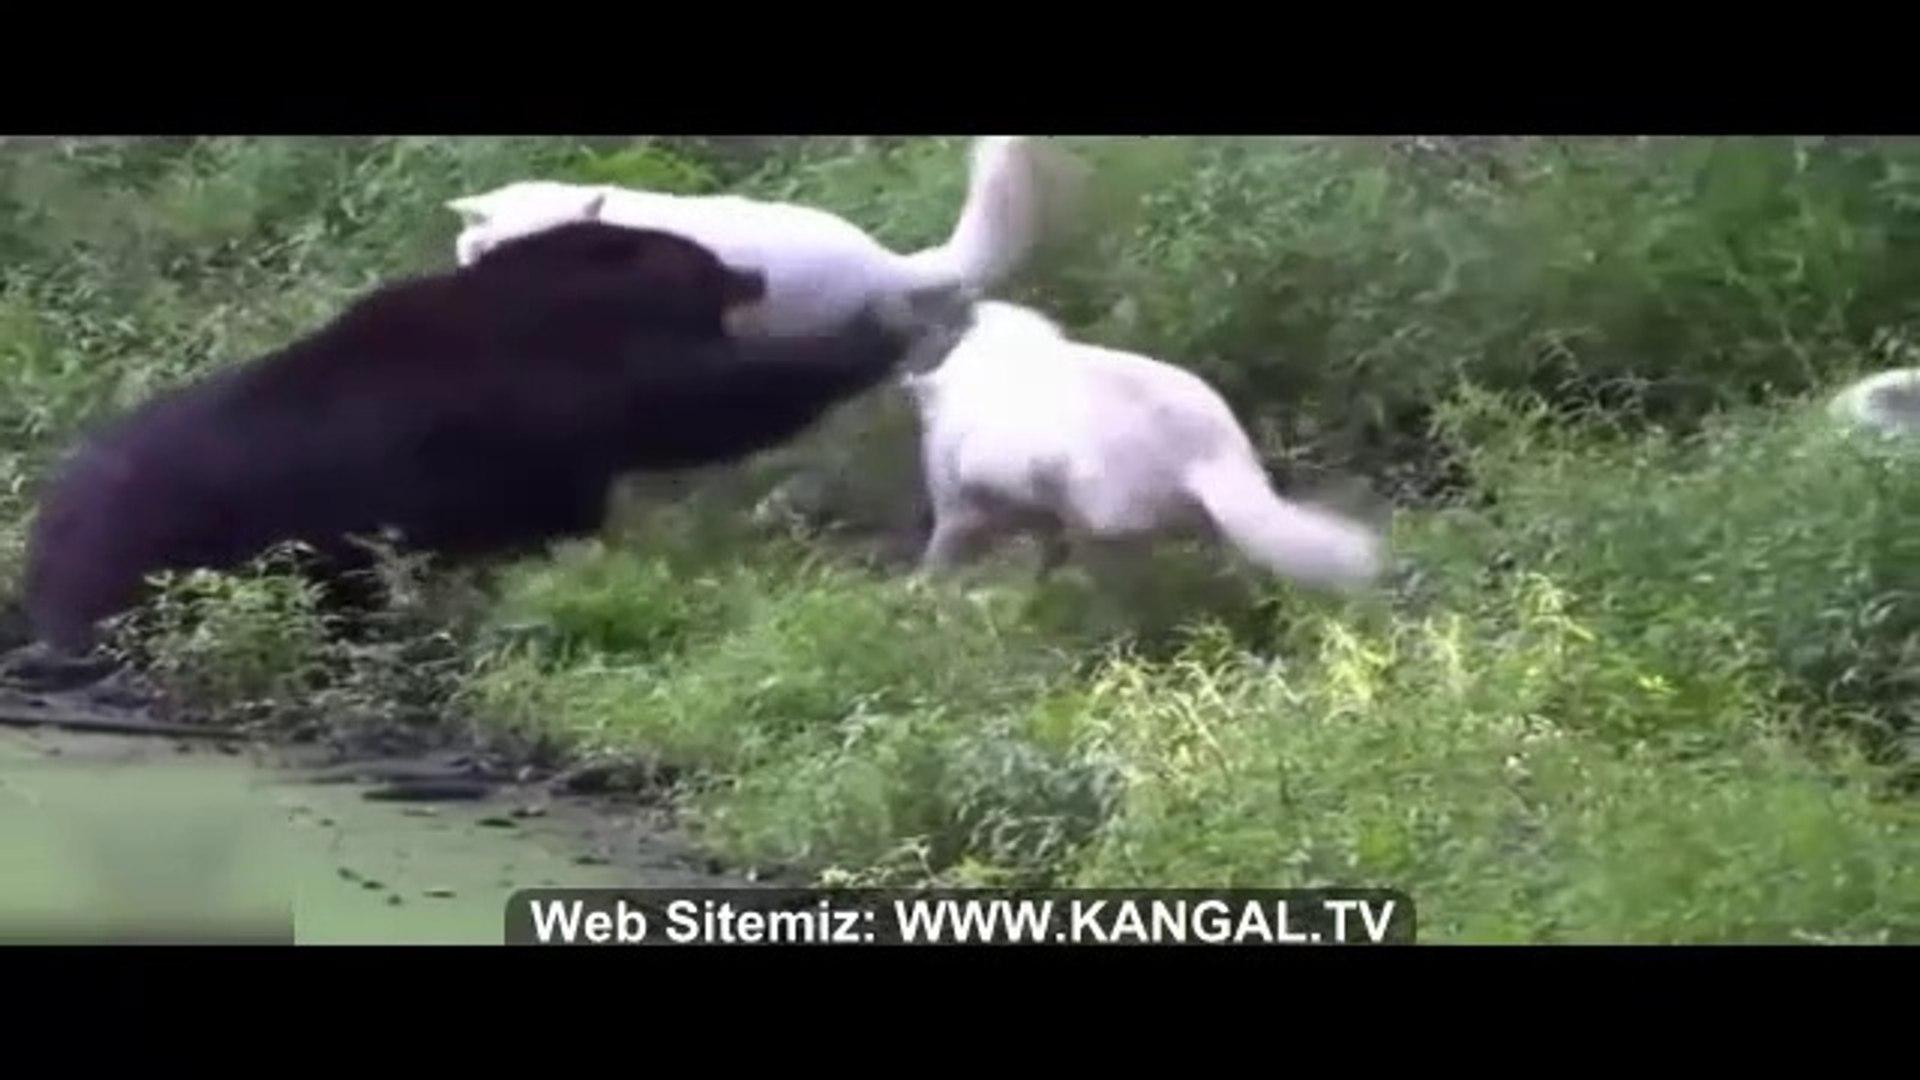 KURTLARIN AYIYA SALDIRISI - WOLVES BEAR ATTACK